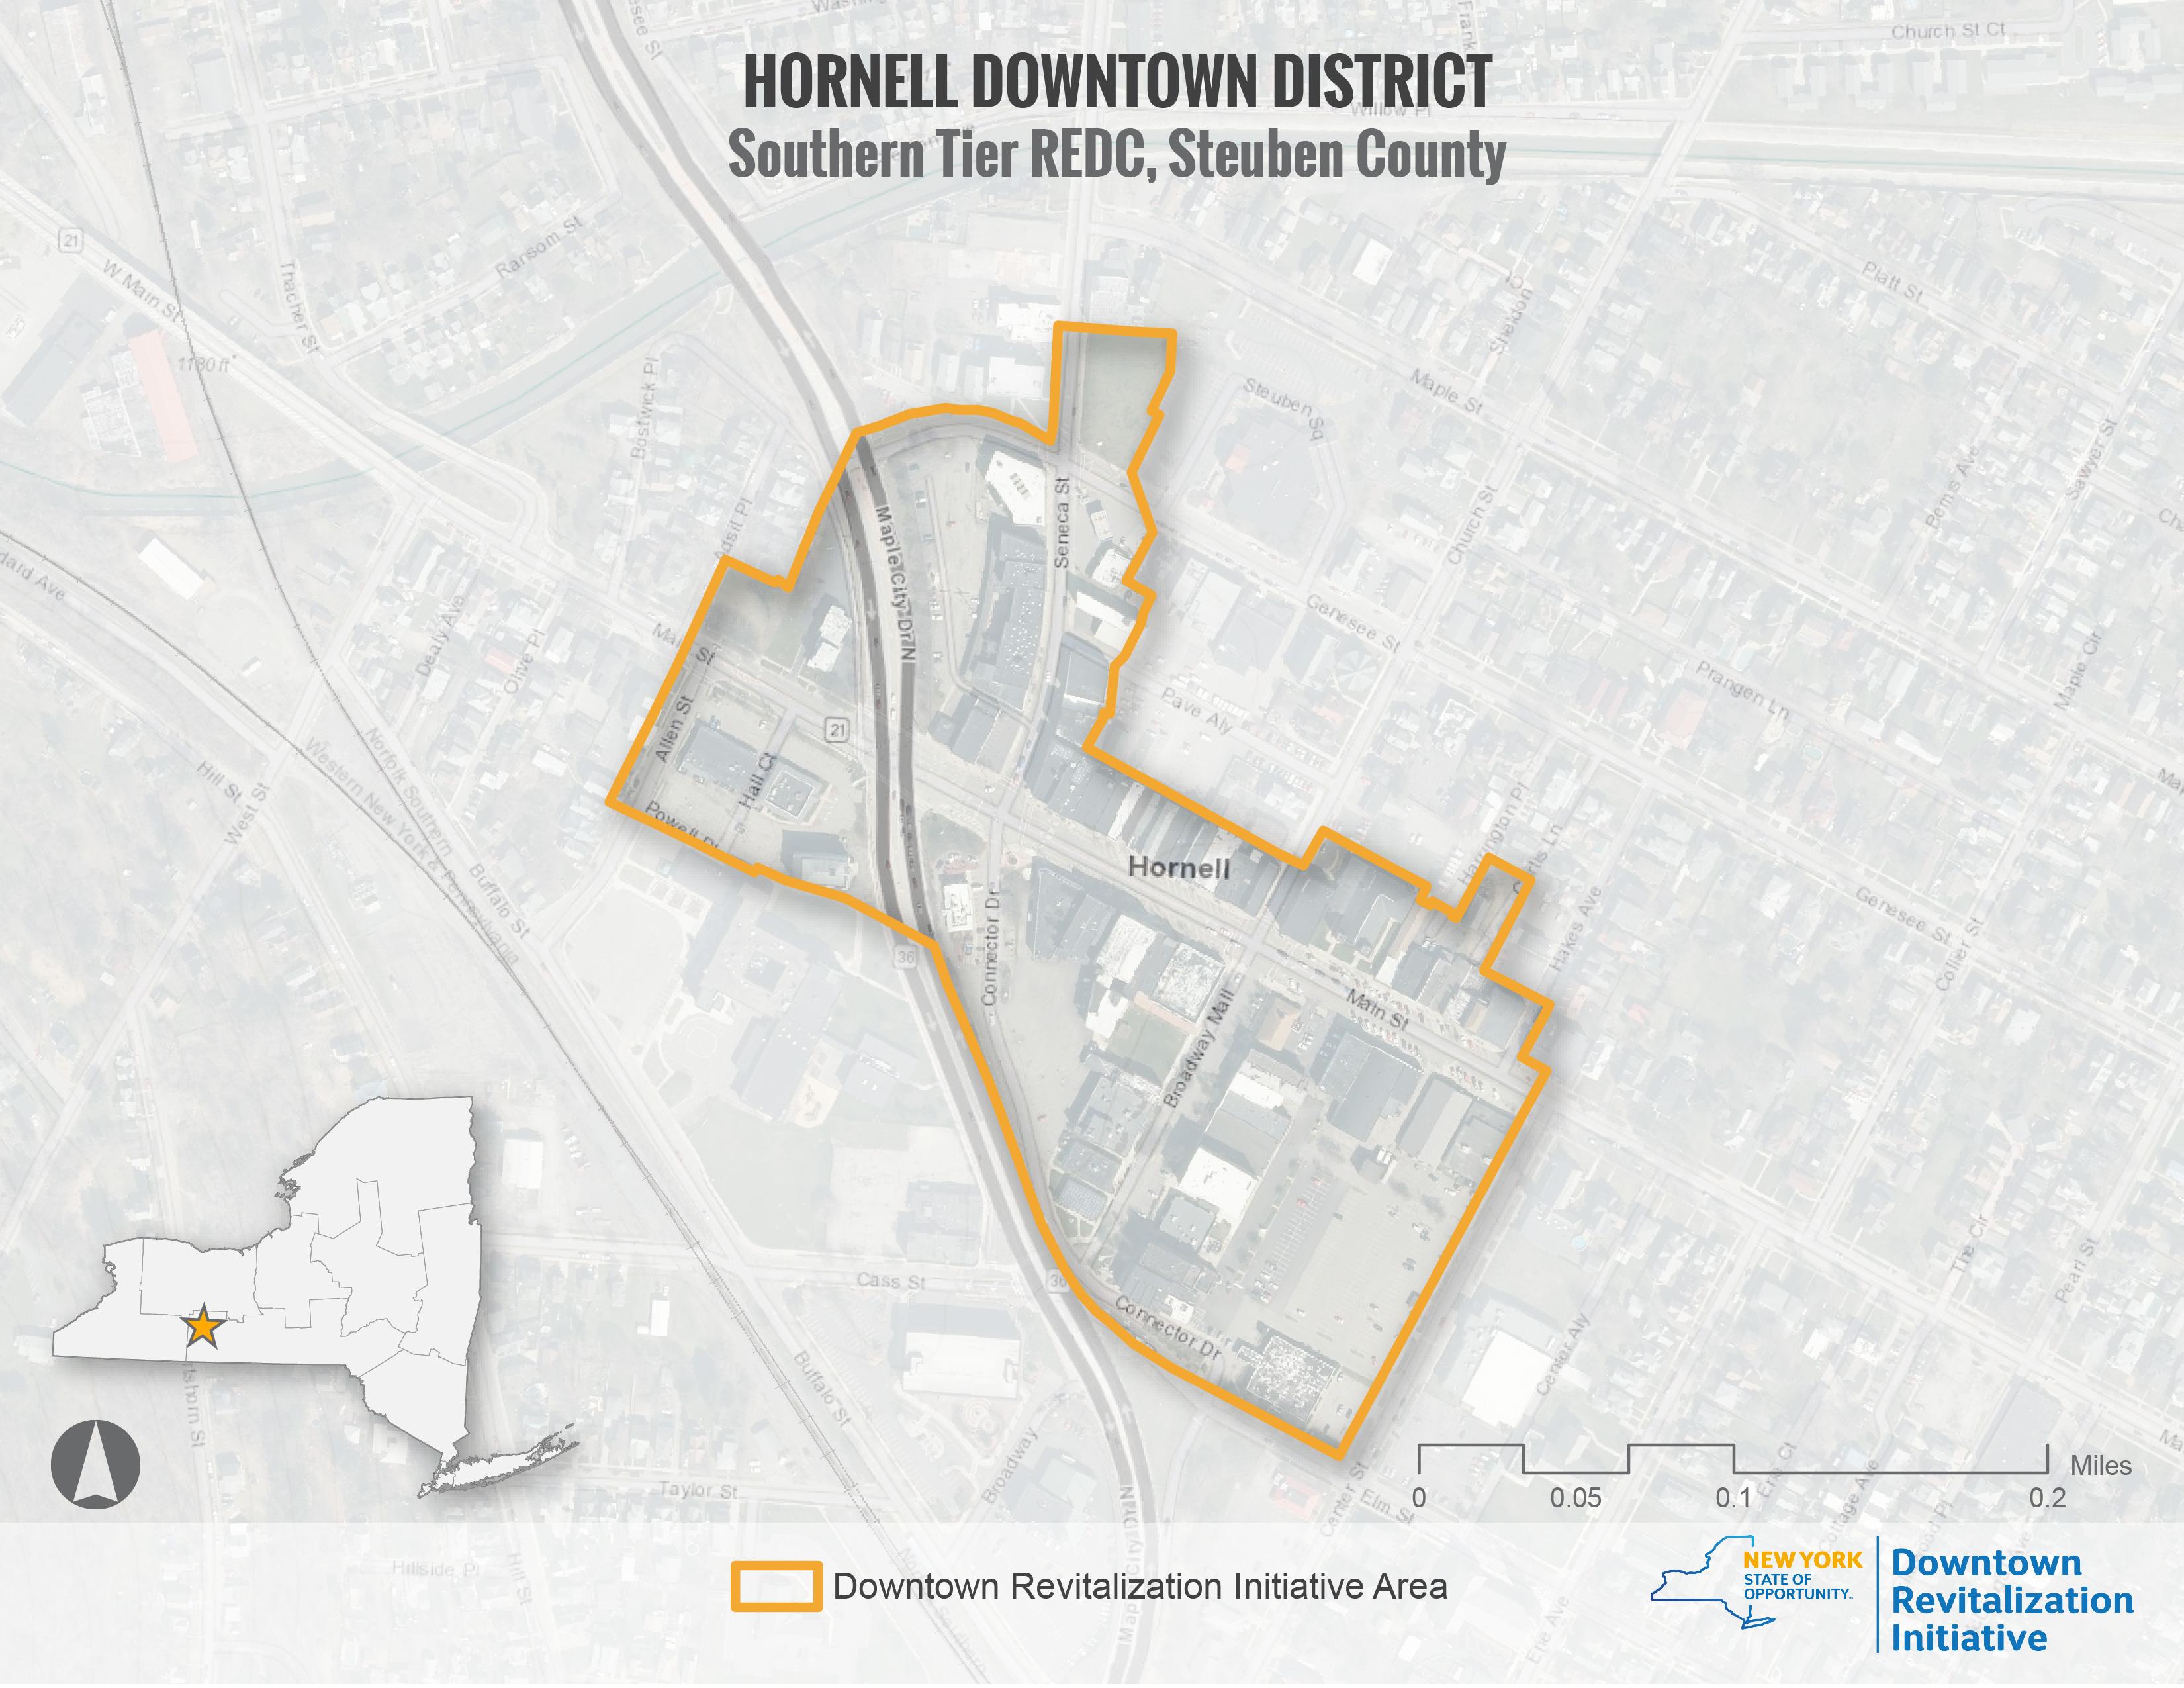 Hornell DRI Area Map